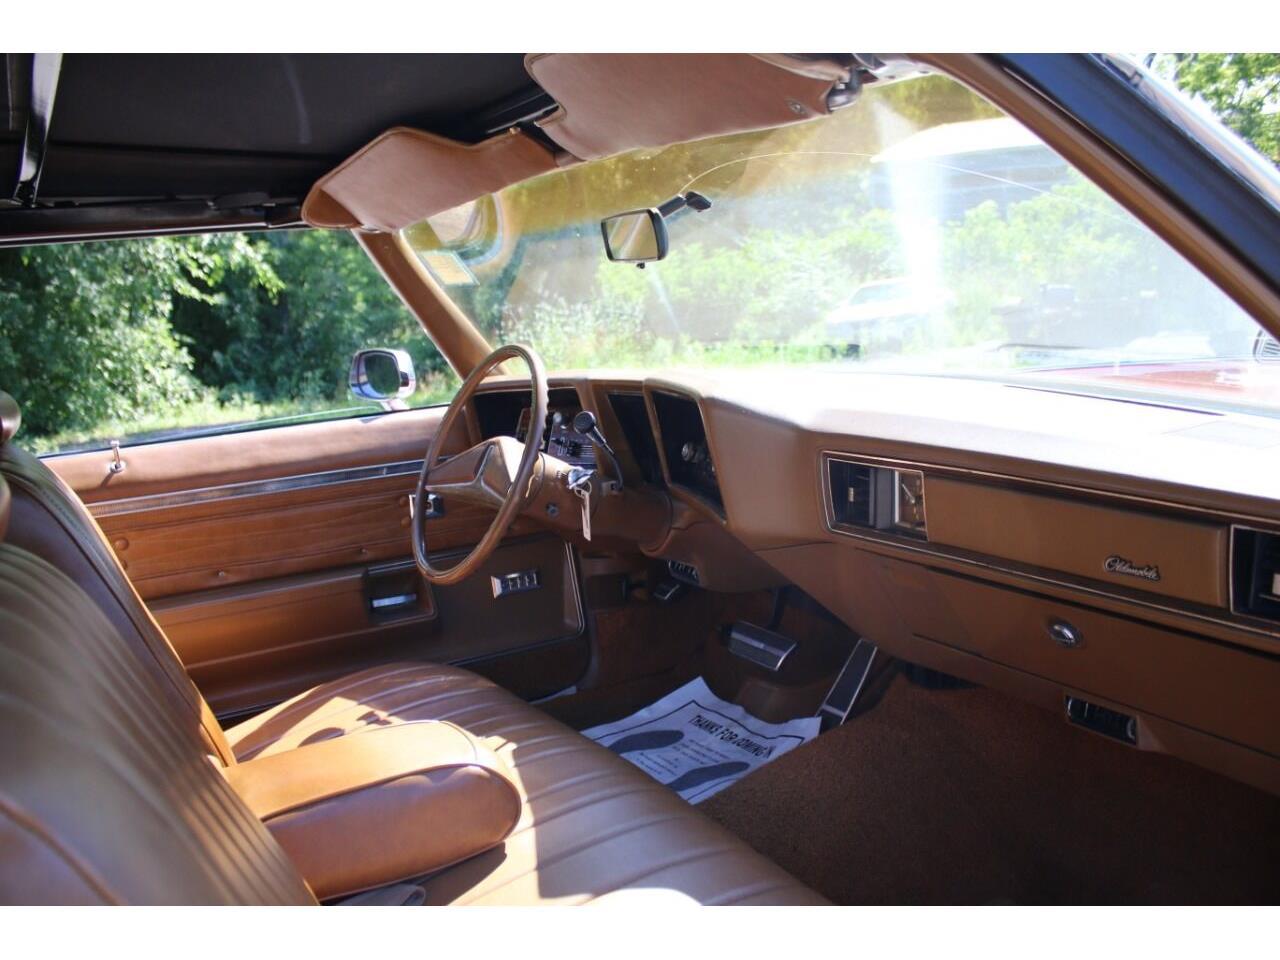 1972 Oldsmobile Delta 88 (CC-1368043) for sale in Hilton, New York